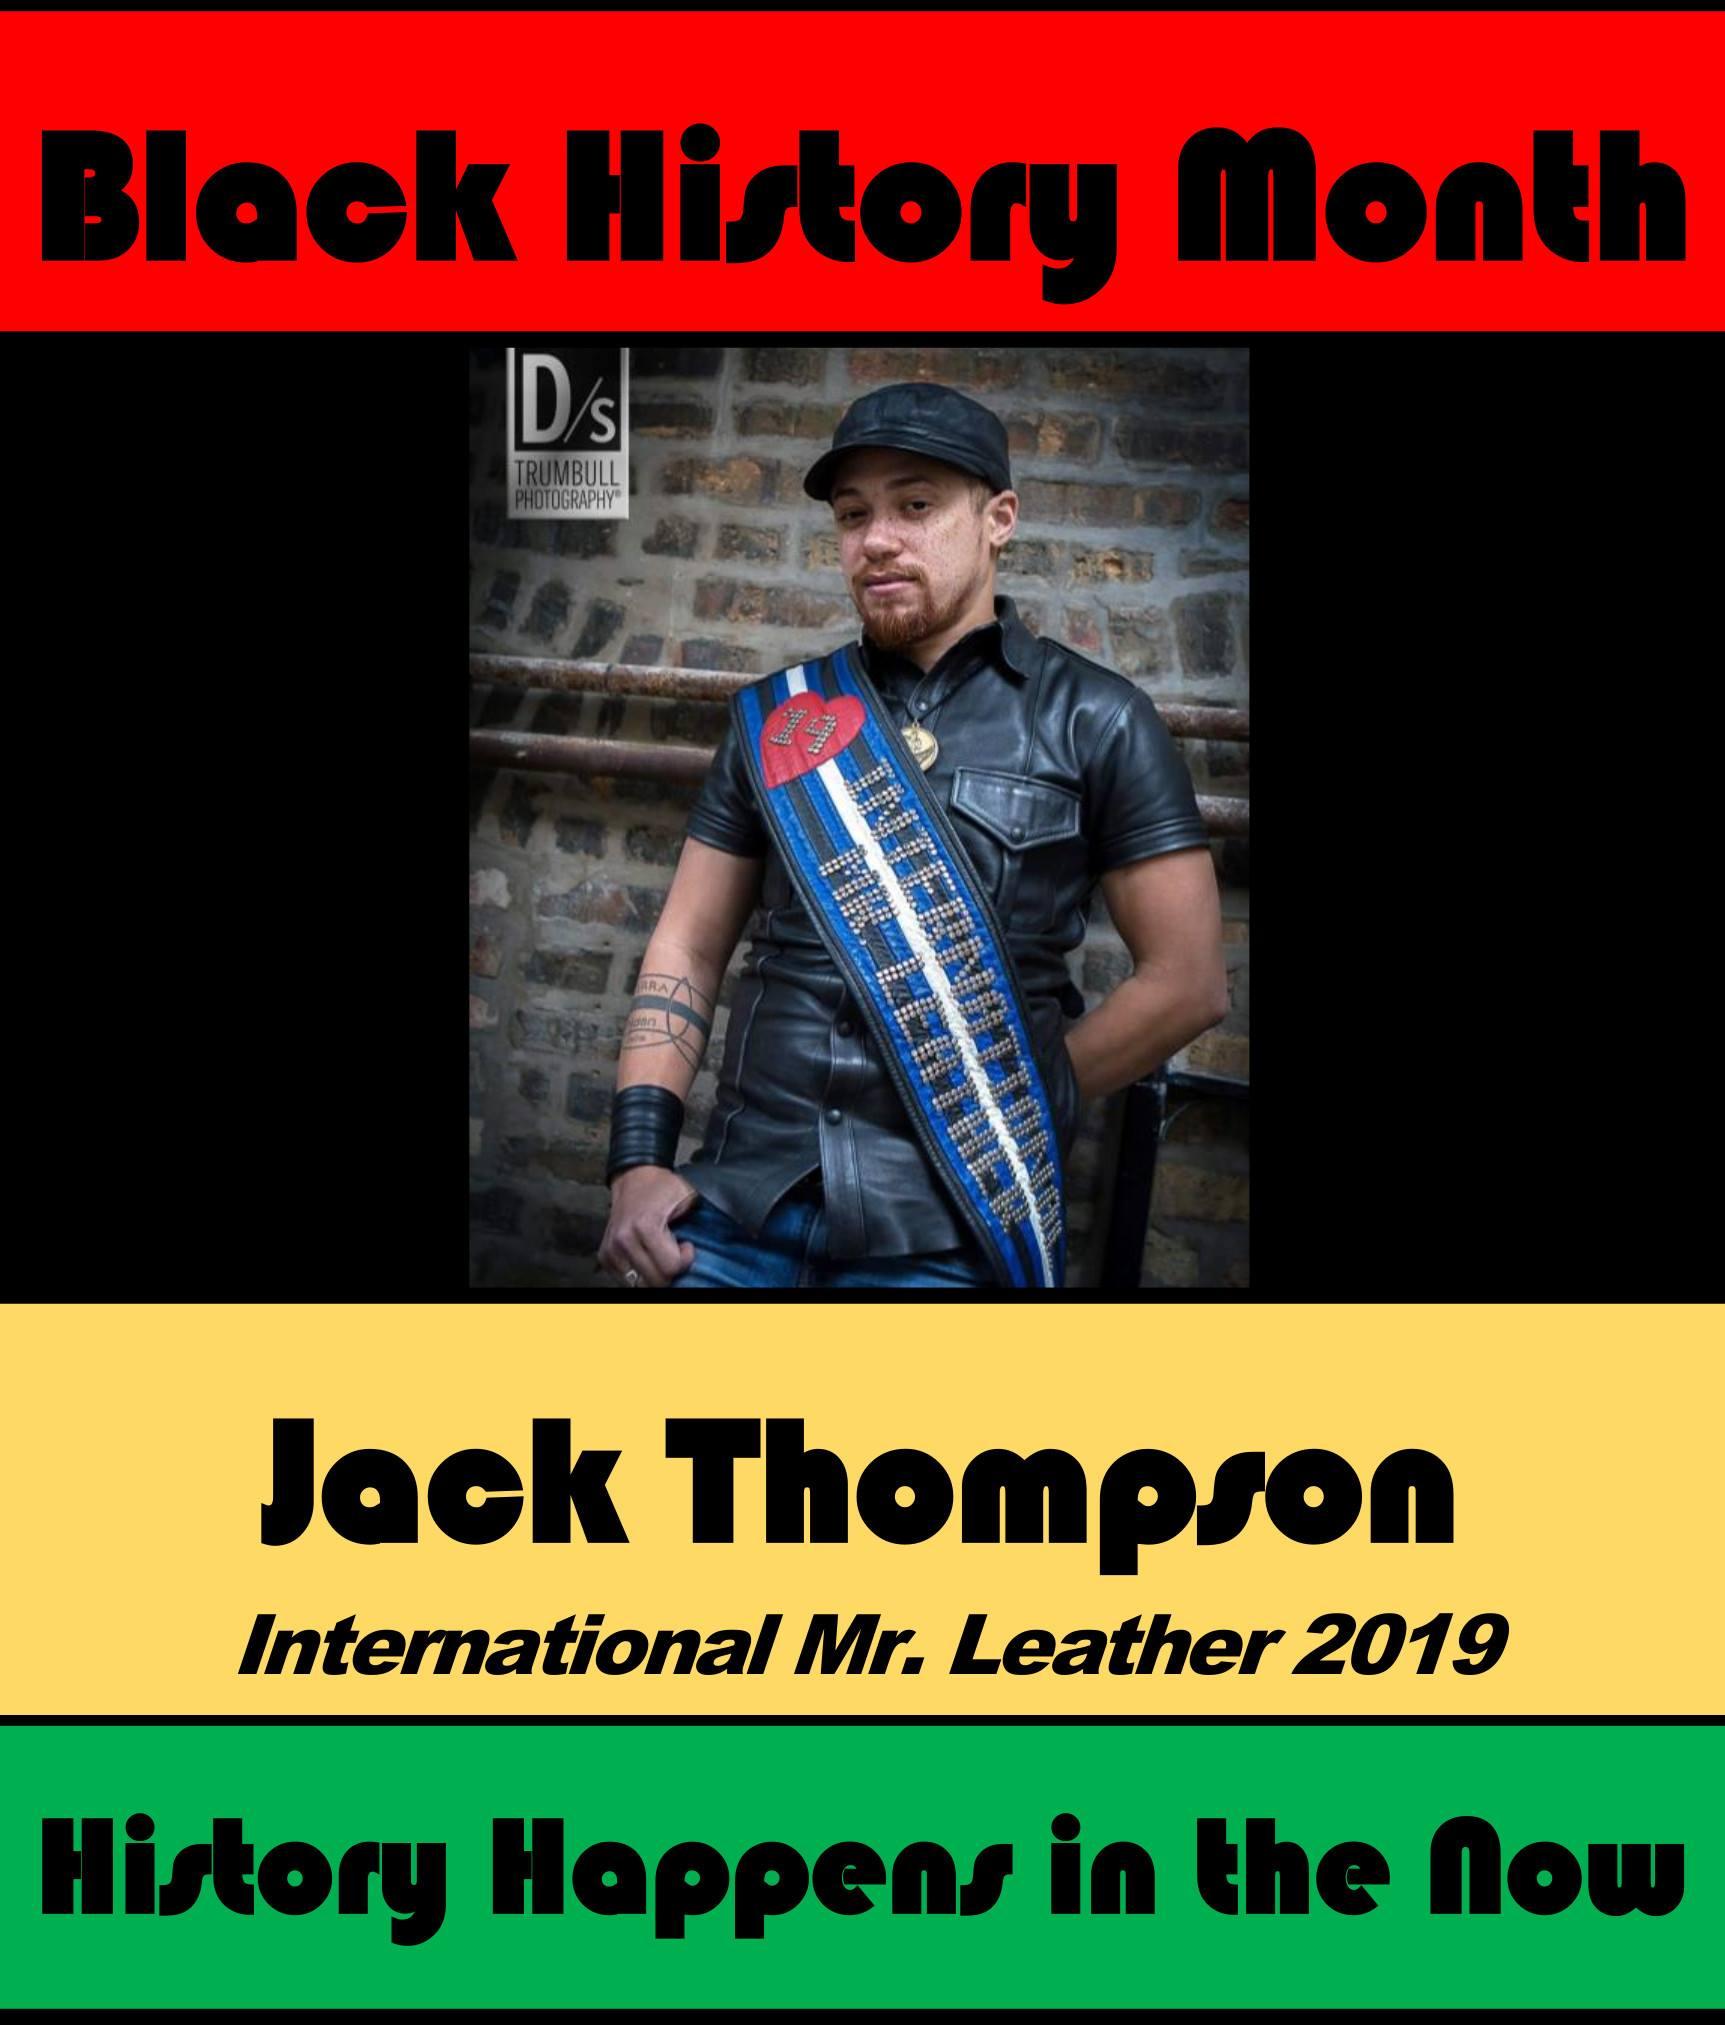 Jack Thompson #POCKLEBlackHistoryMonth